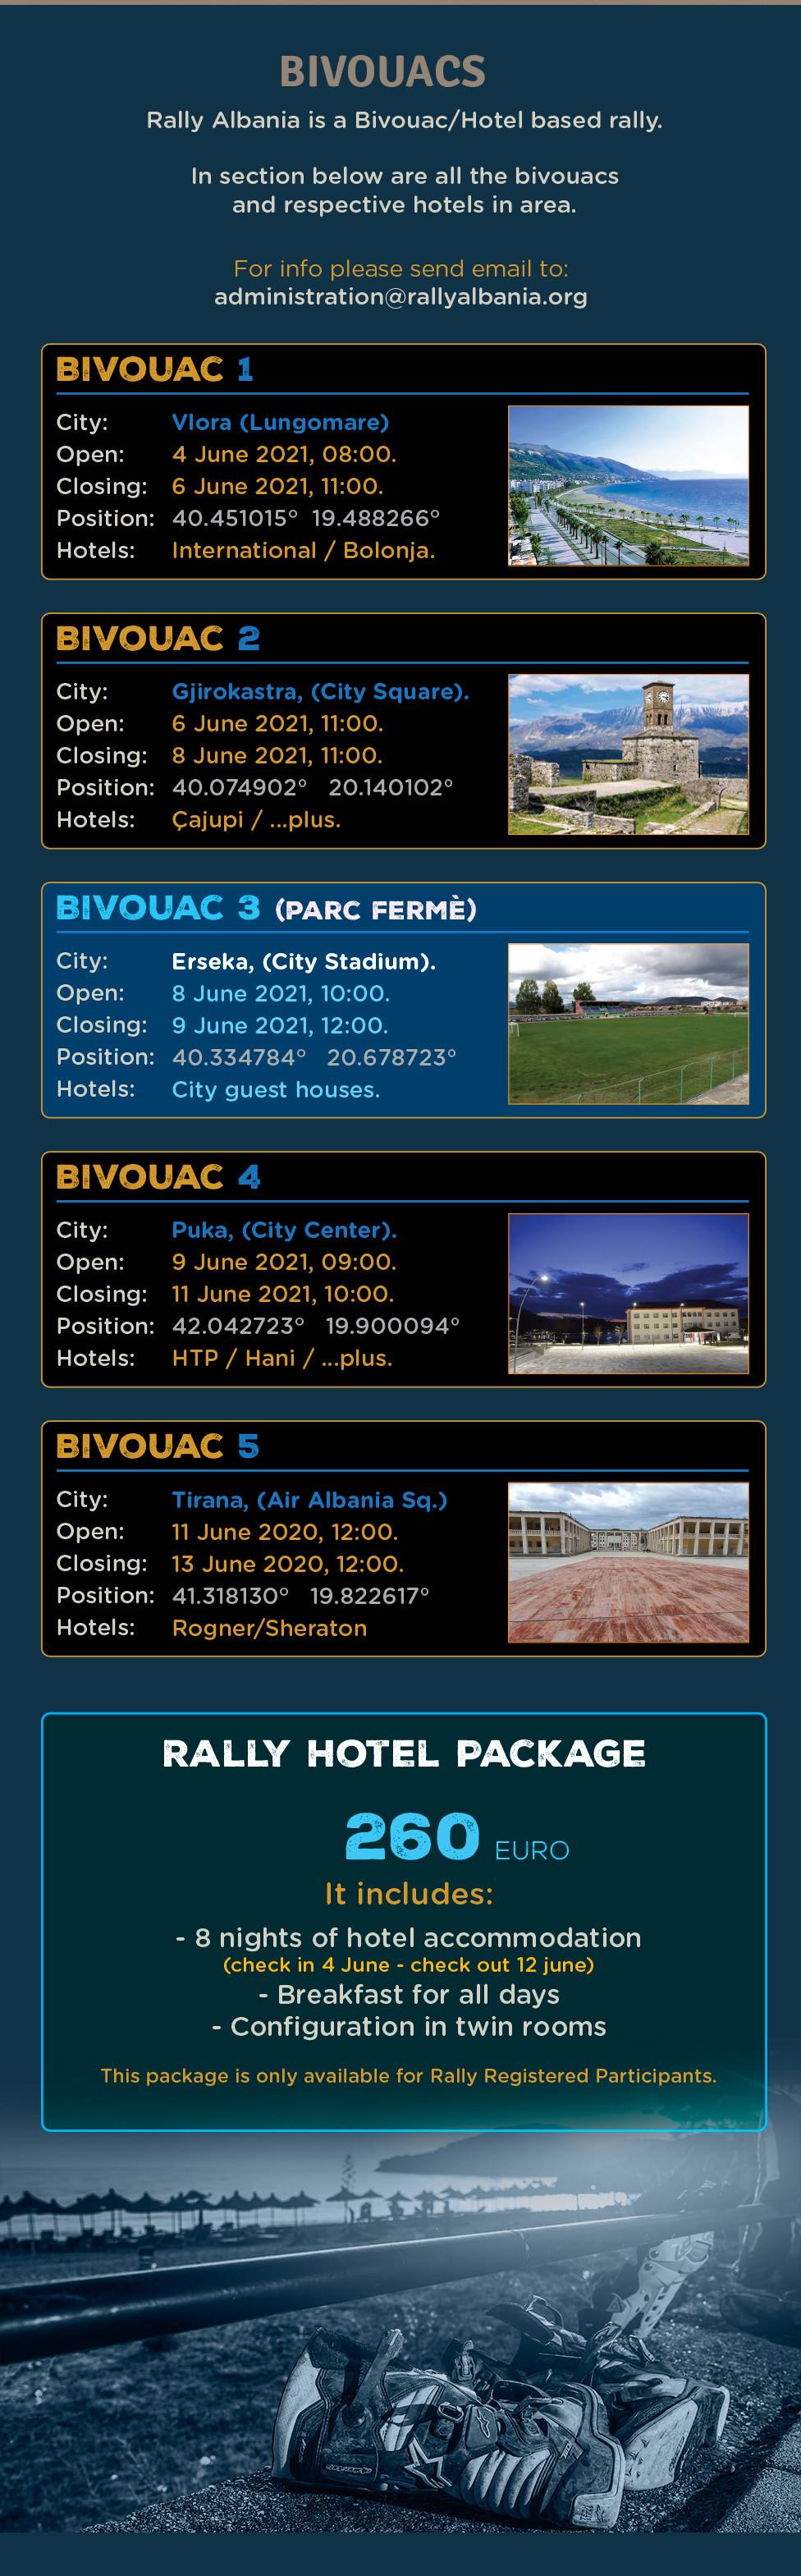 bivouac-2.jpg